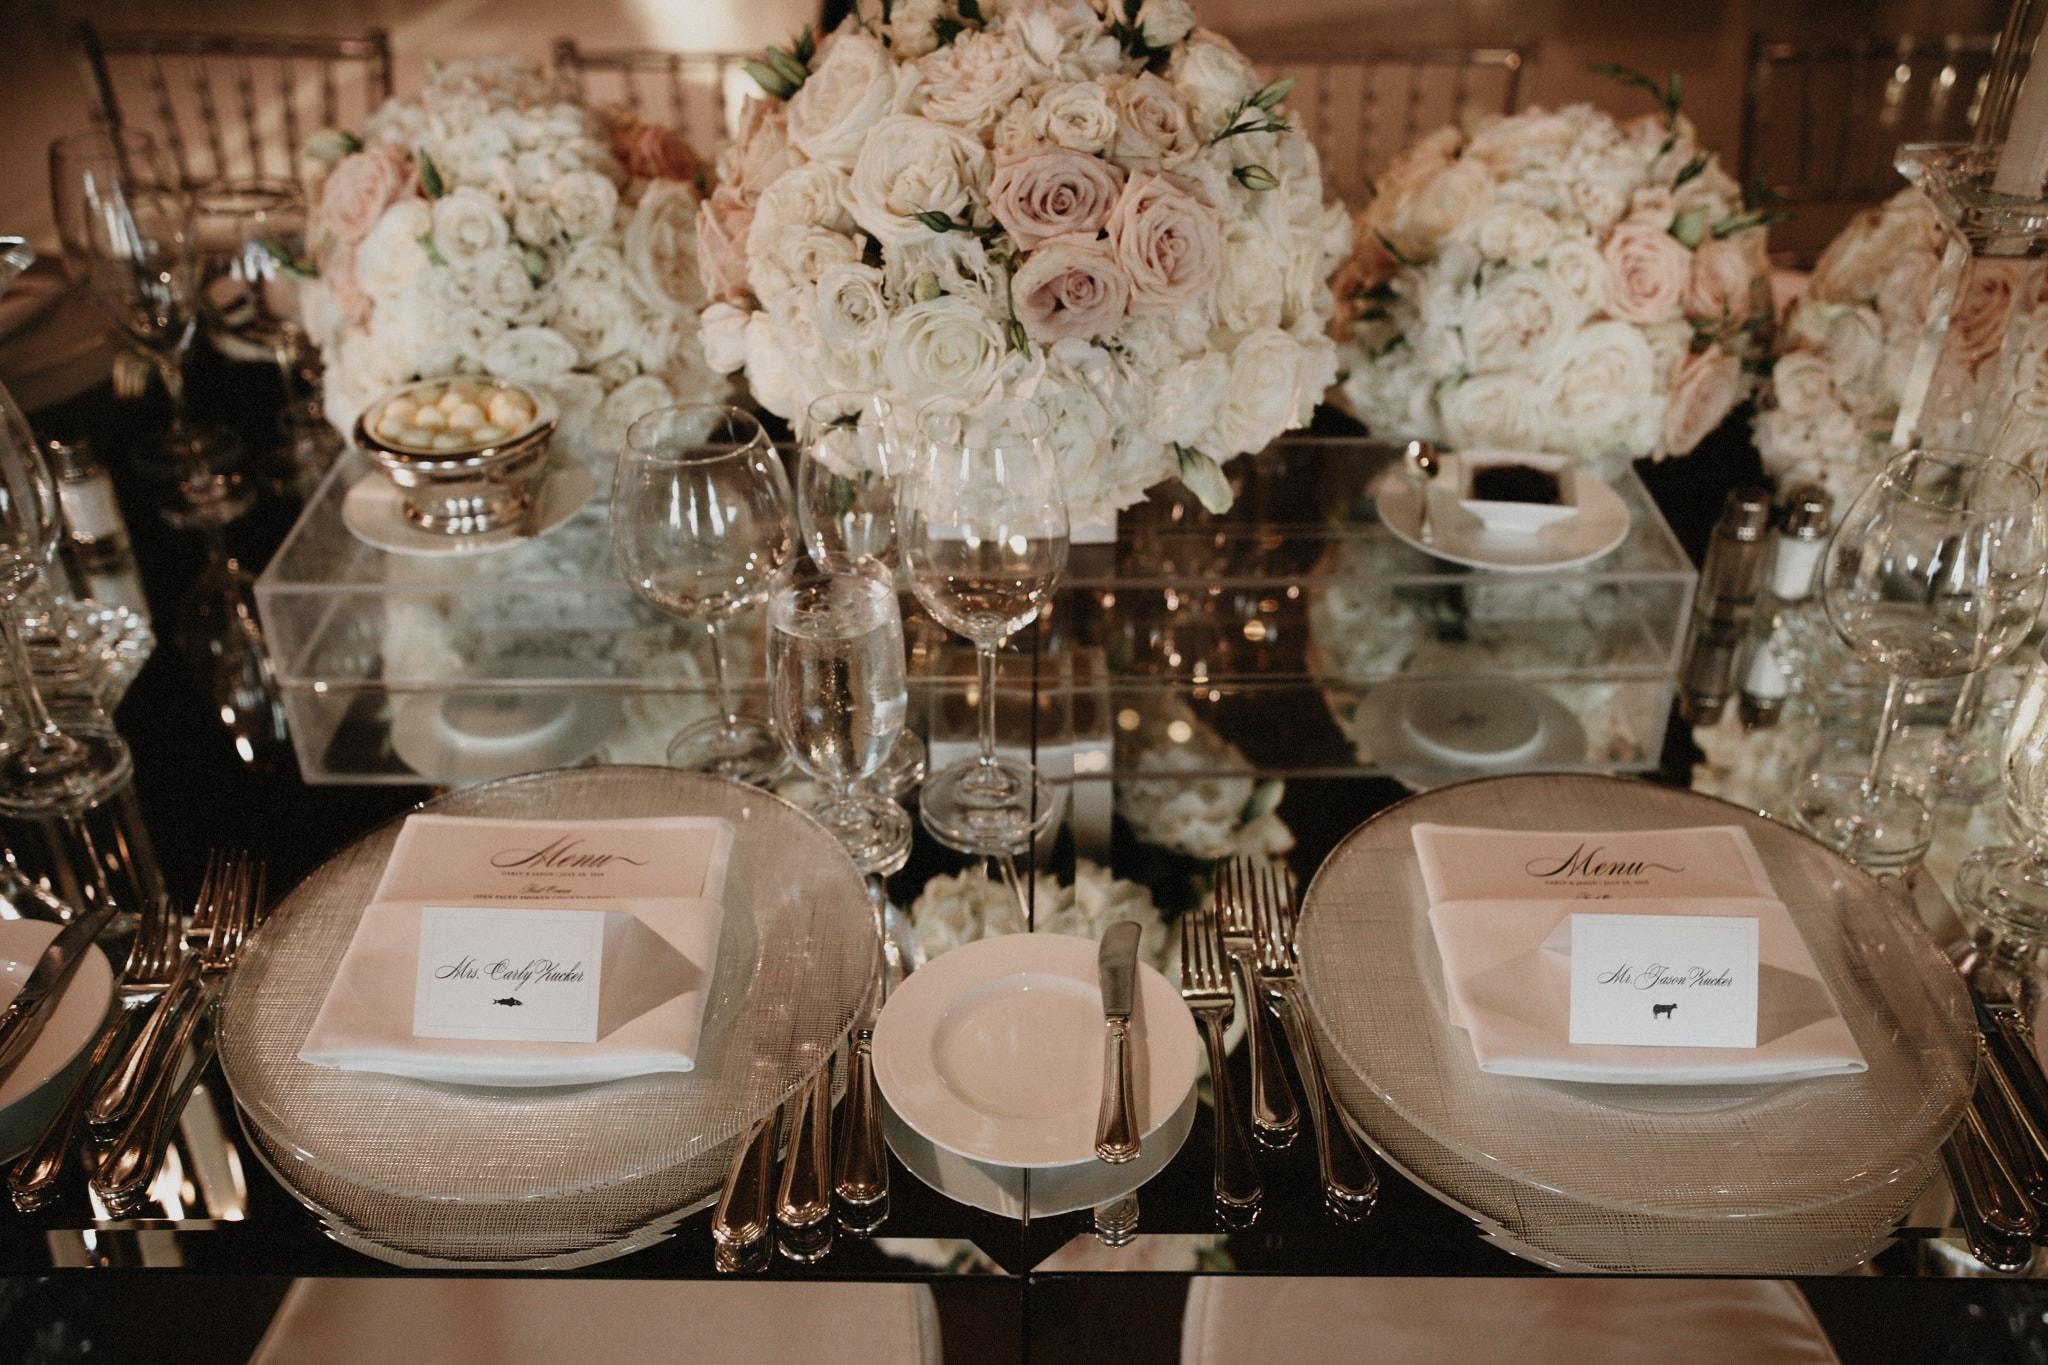 062-wedding-reception-venue-ideas.jpg